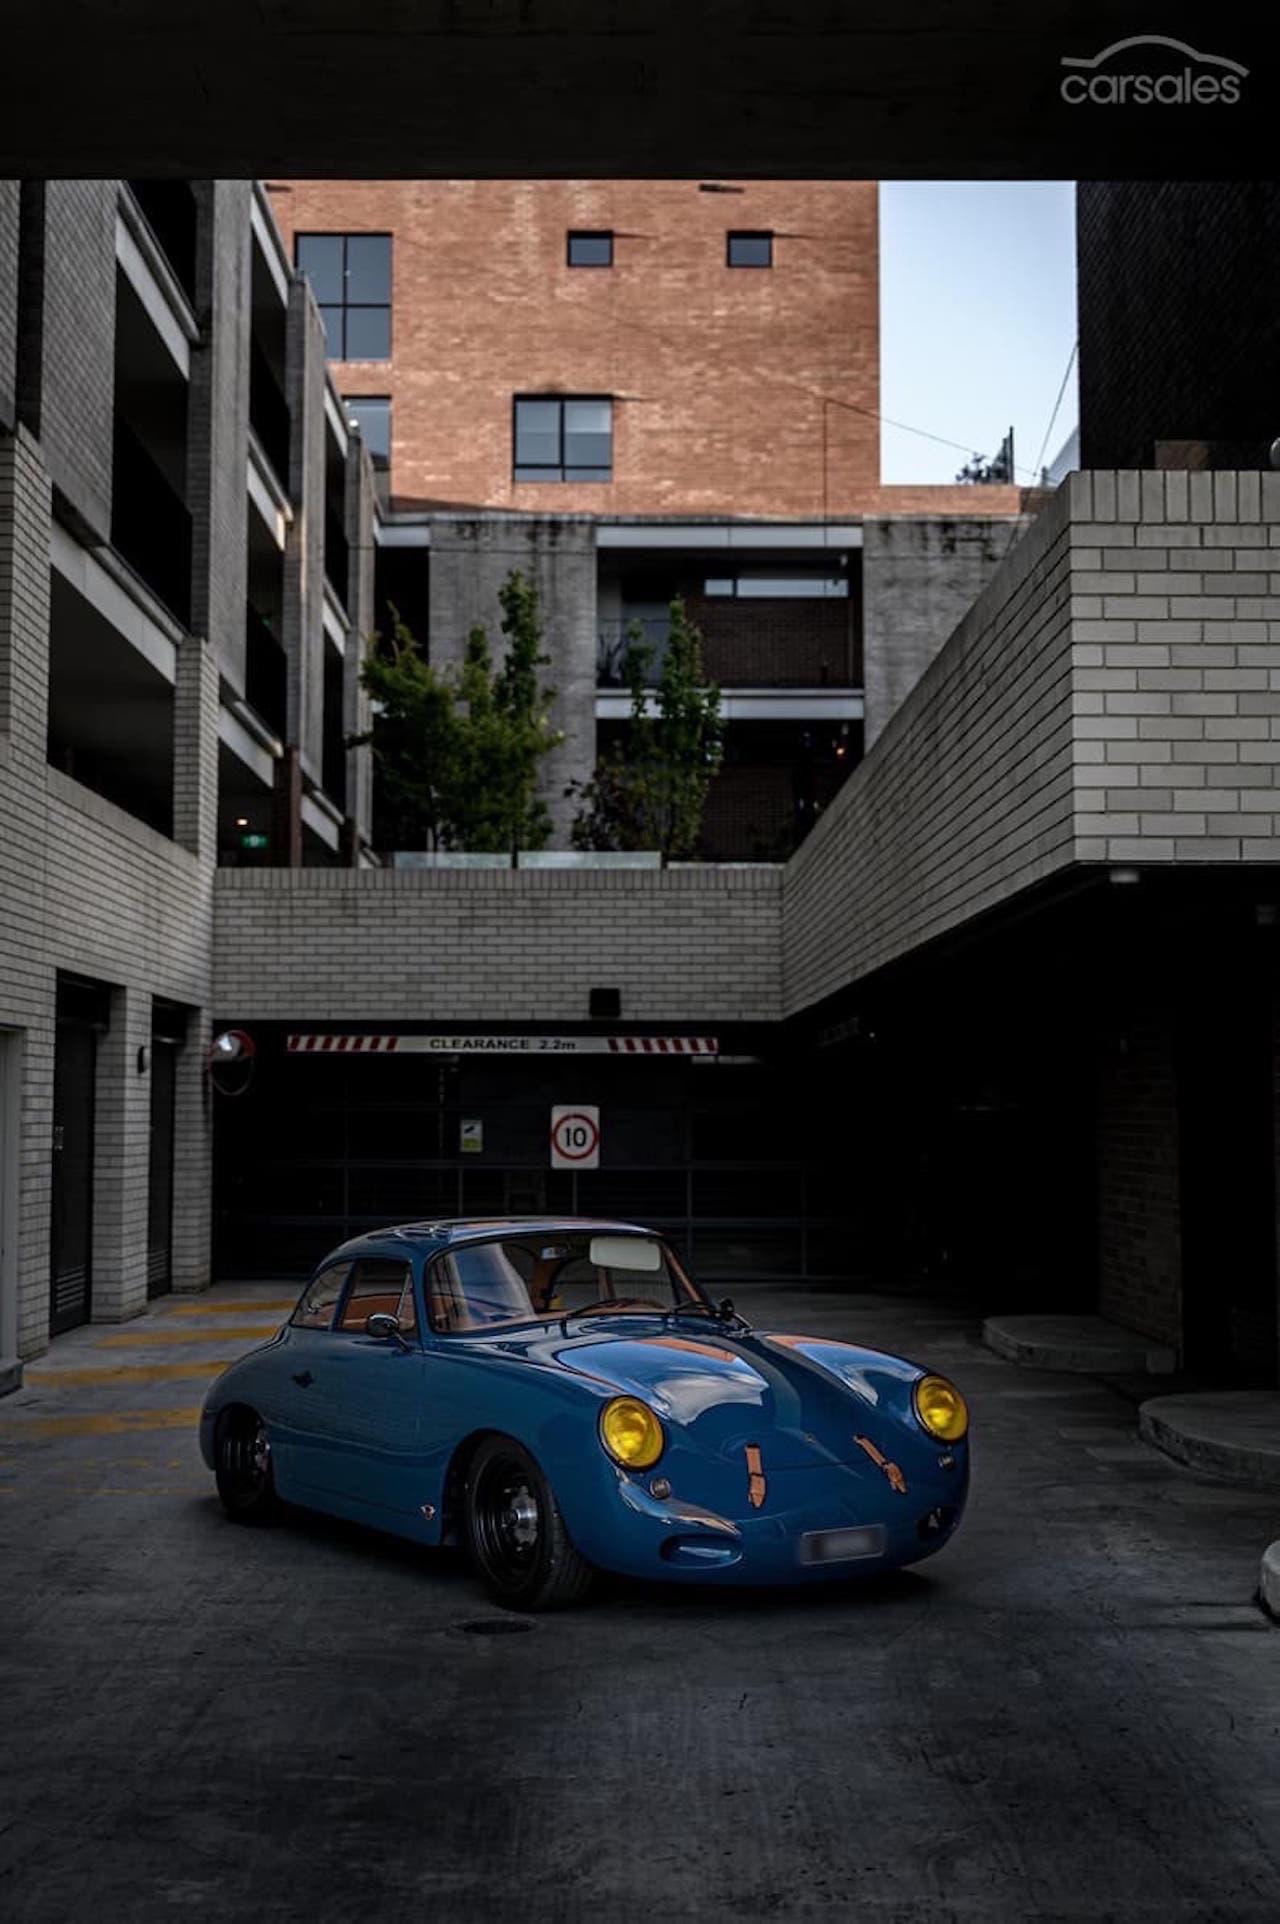 Porsche 356B Notchback '62 - Outlaw Thérapie... 7